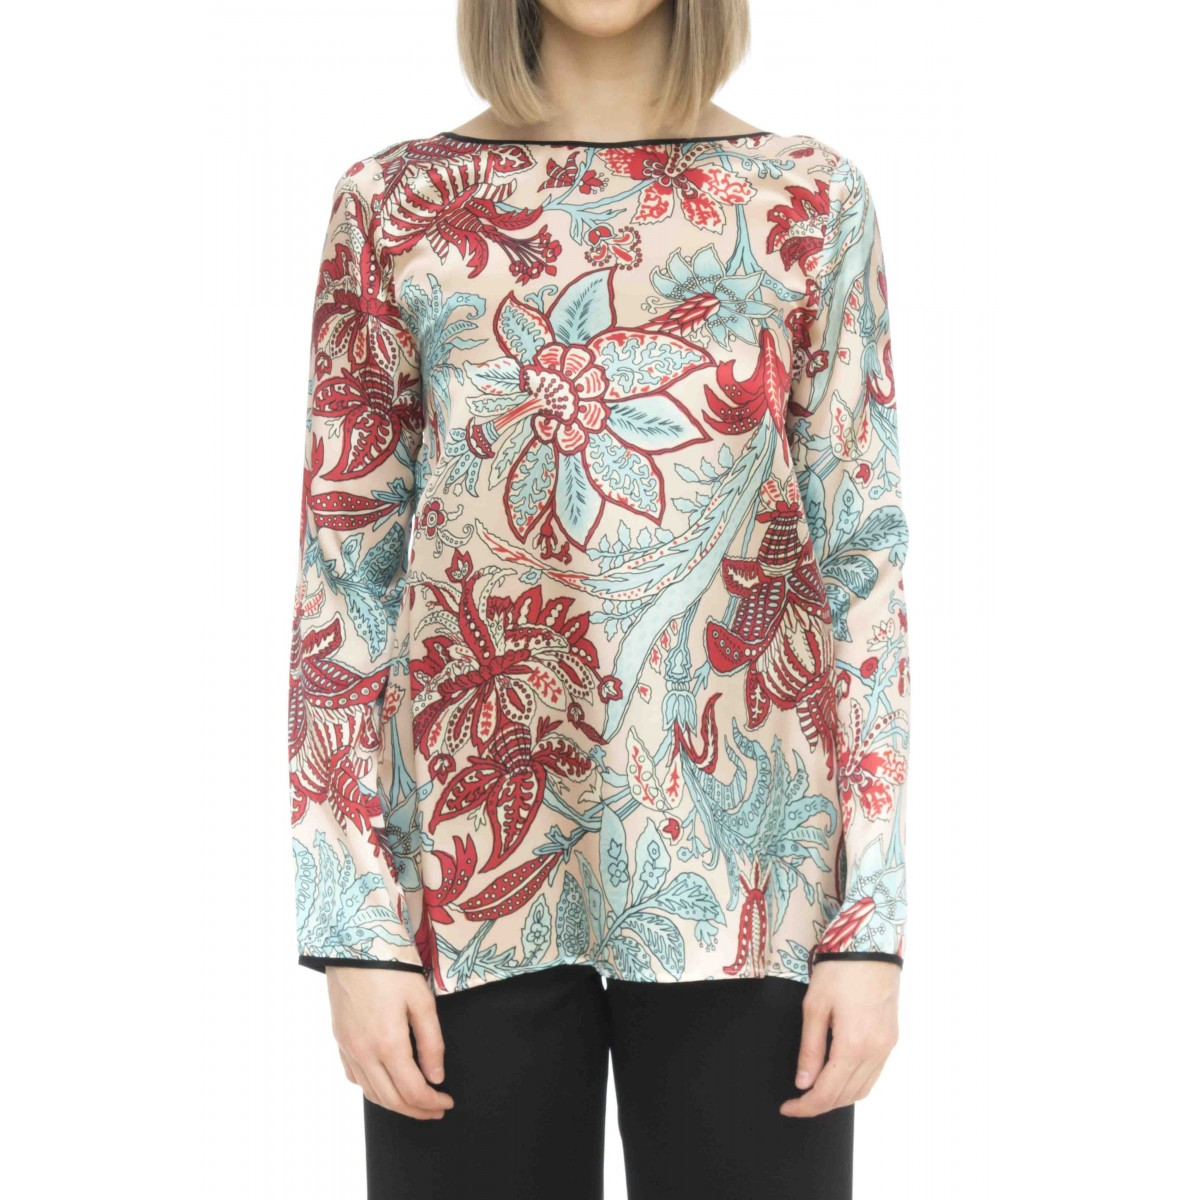 Camicia donna - J2044/f camicia manica lunga stampa